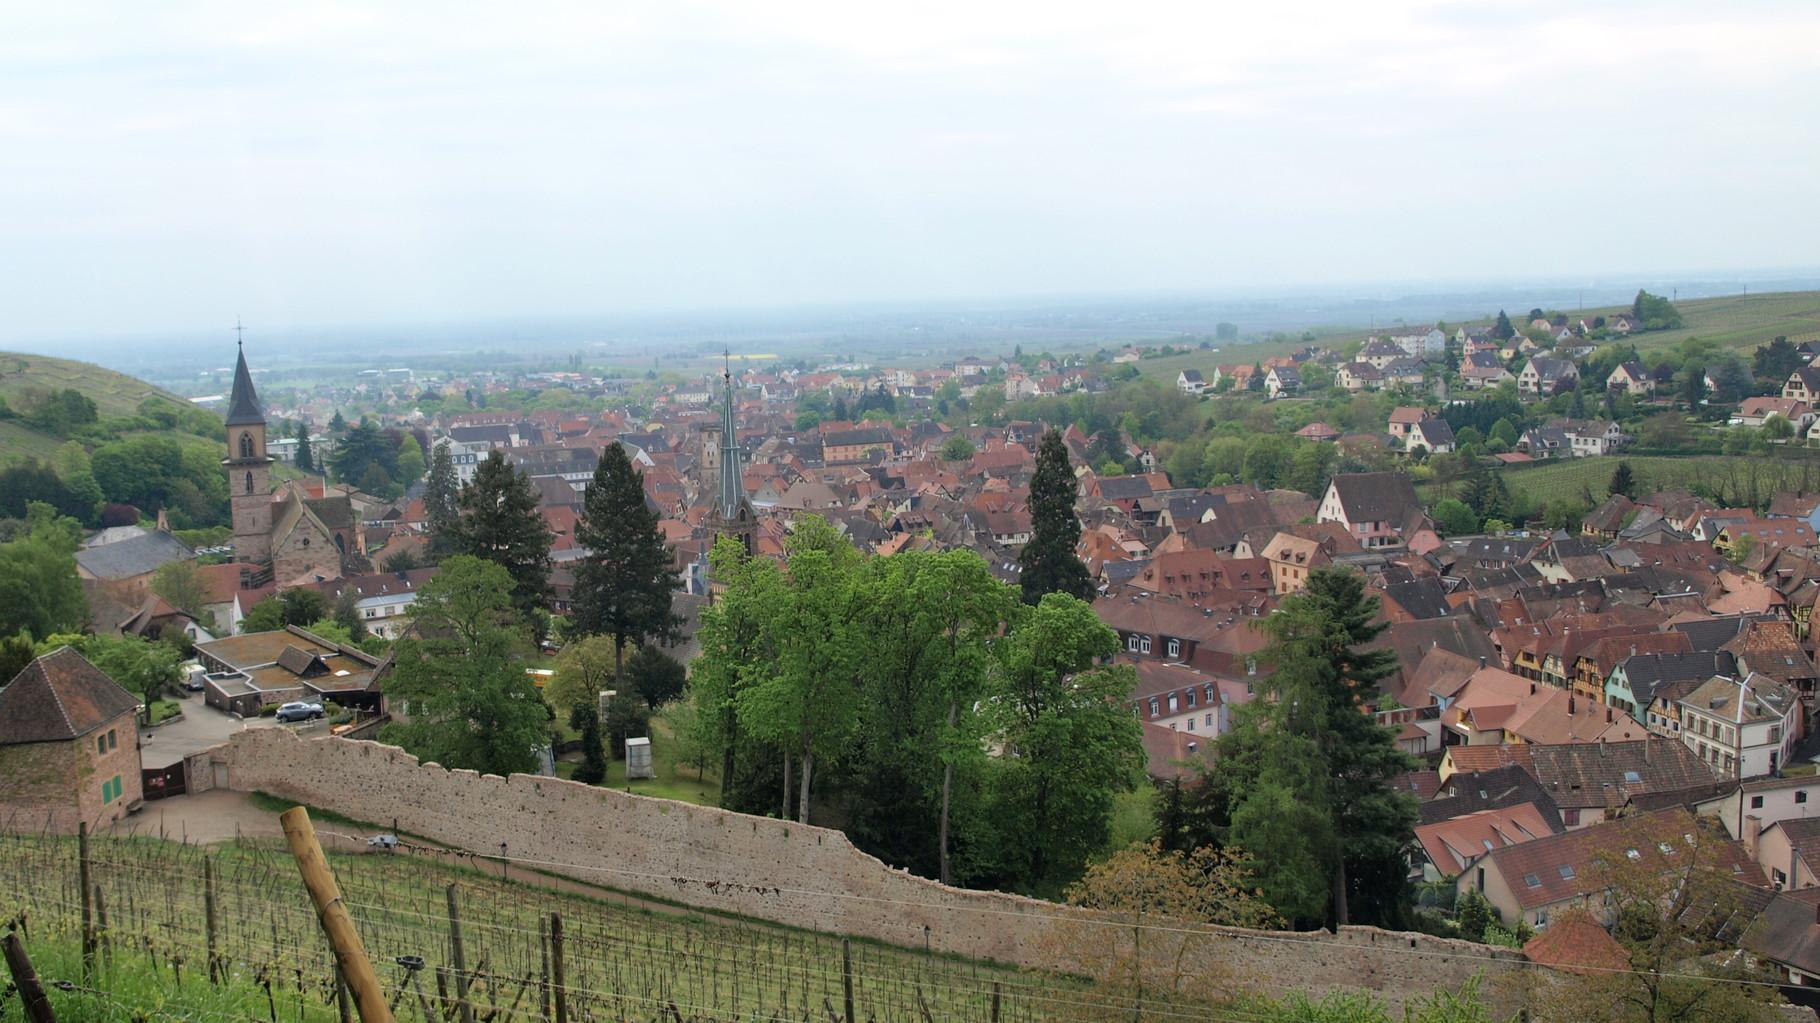 Ribeauvillé - enceinte du château Ribeaupierre